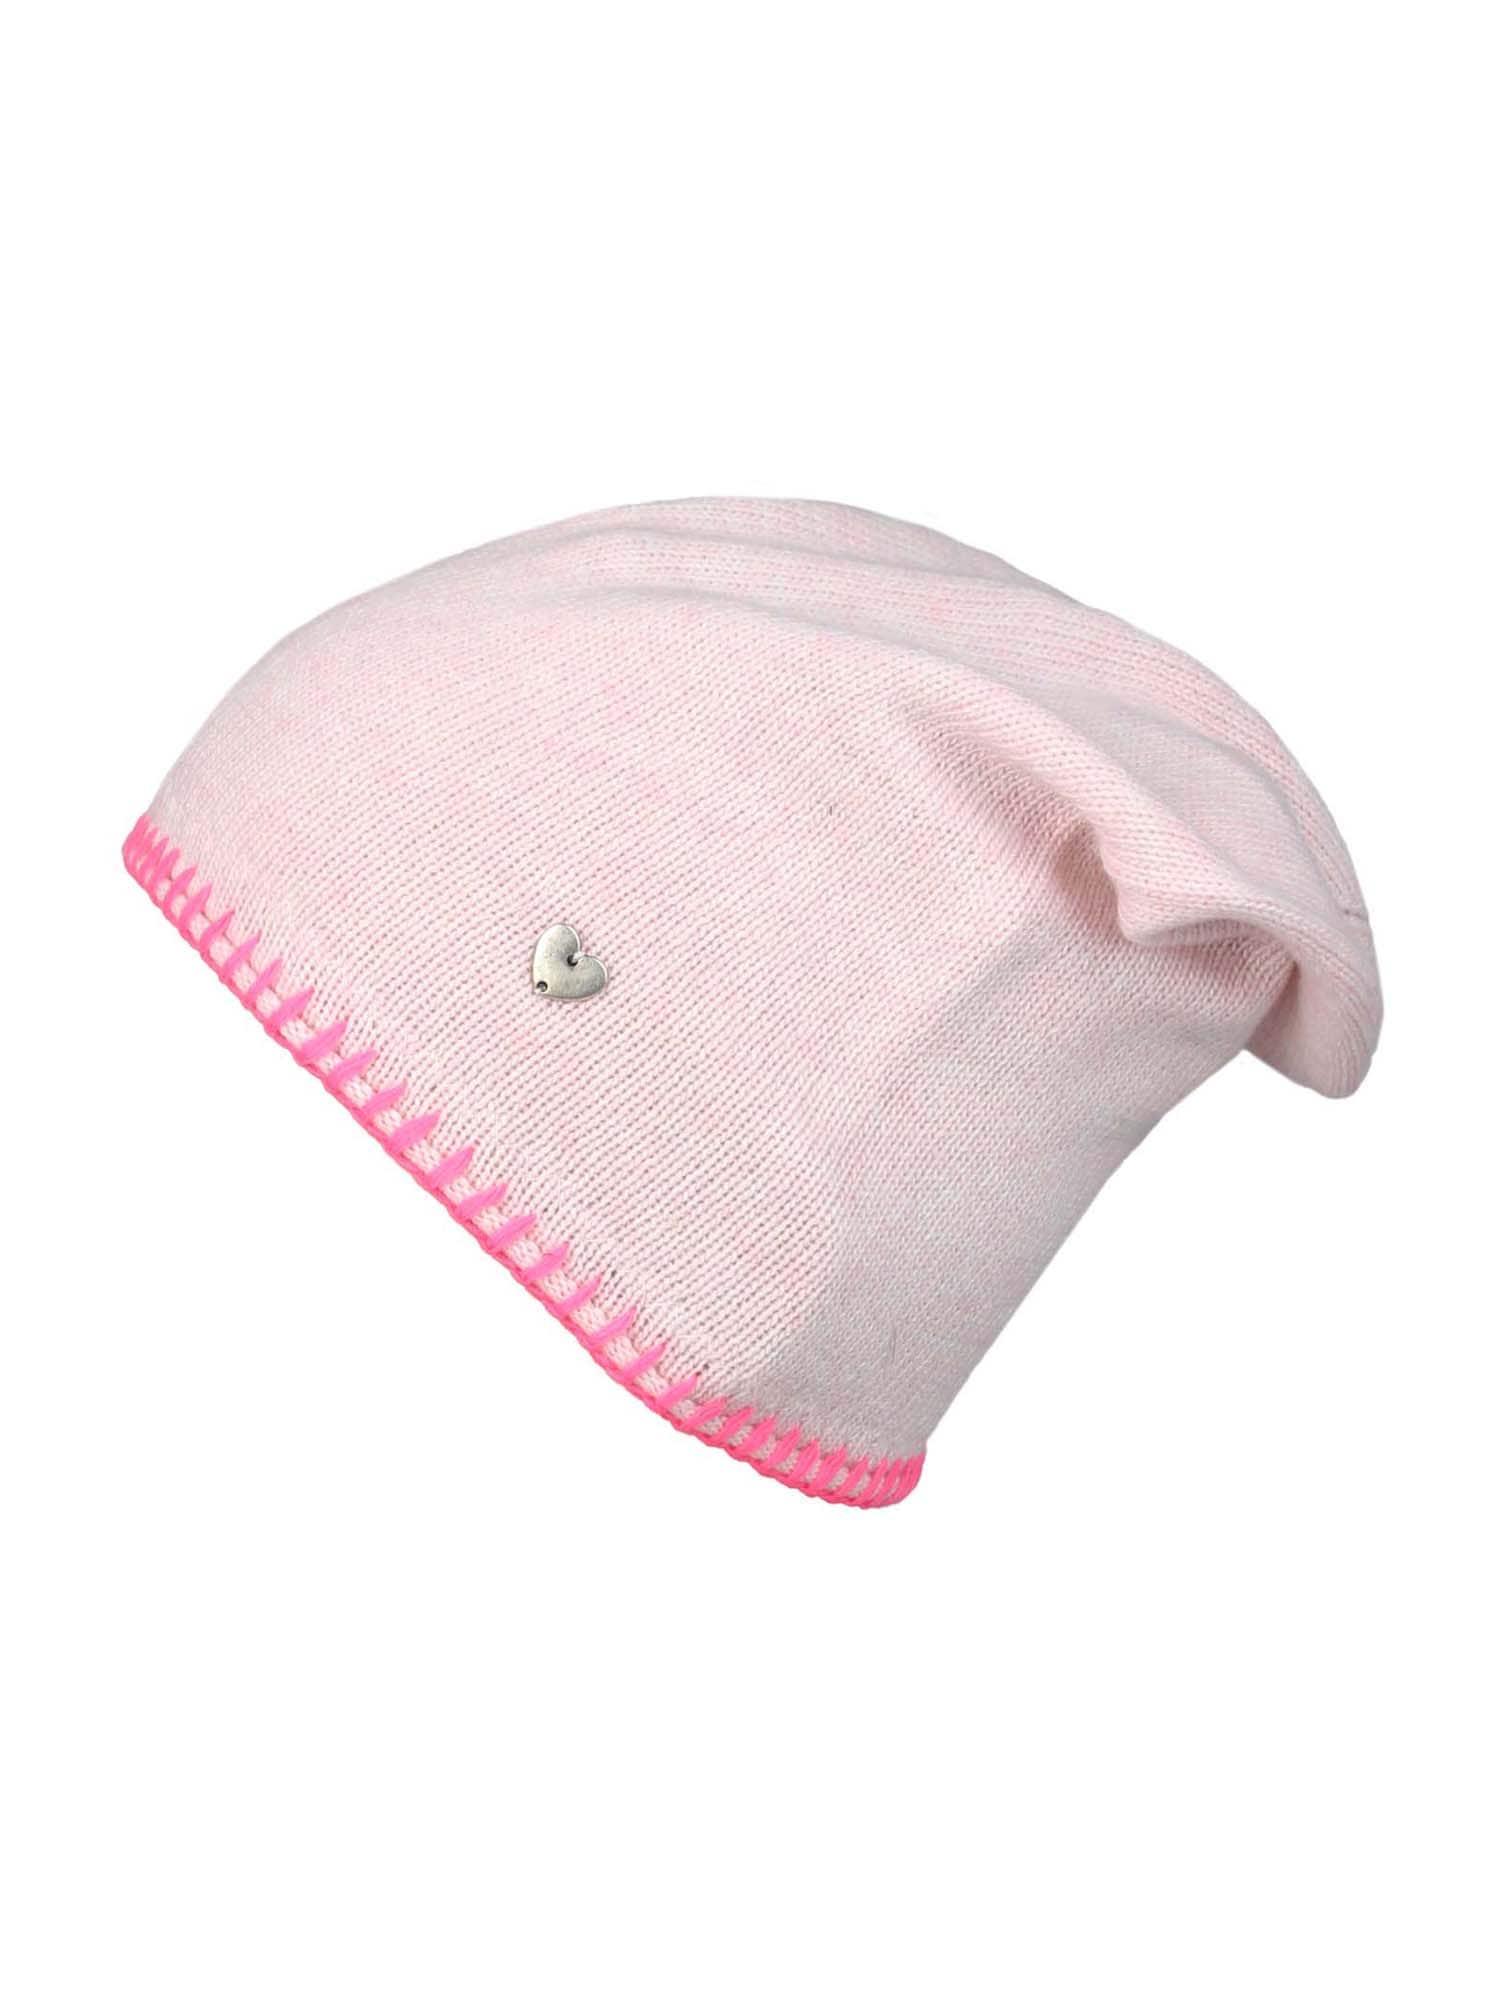 Zwillingsherz Megzta kepurė rožių spalva / rožinė